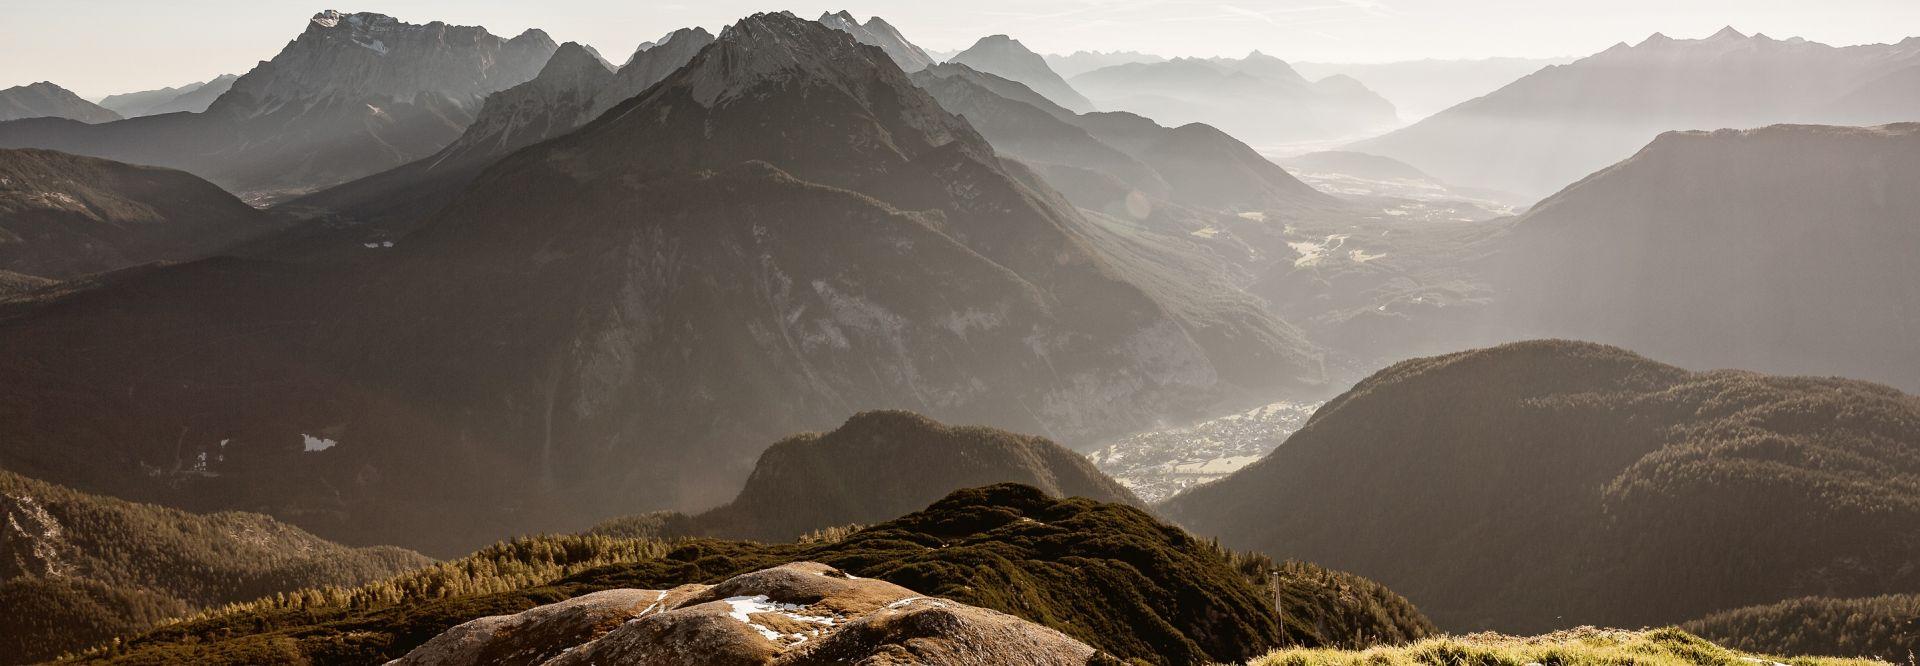 Berglandschaft in der Ferienregion Imst (c) Rudi Wyhlidal (Imst)